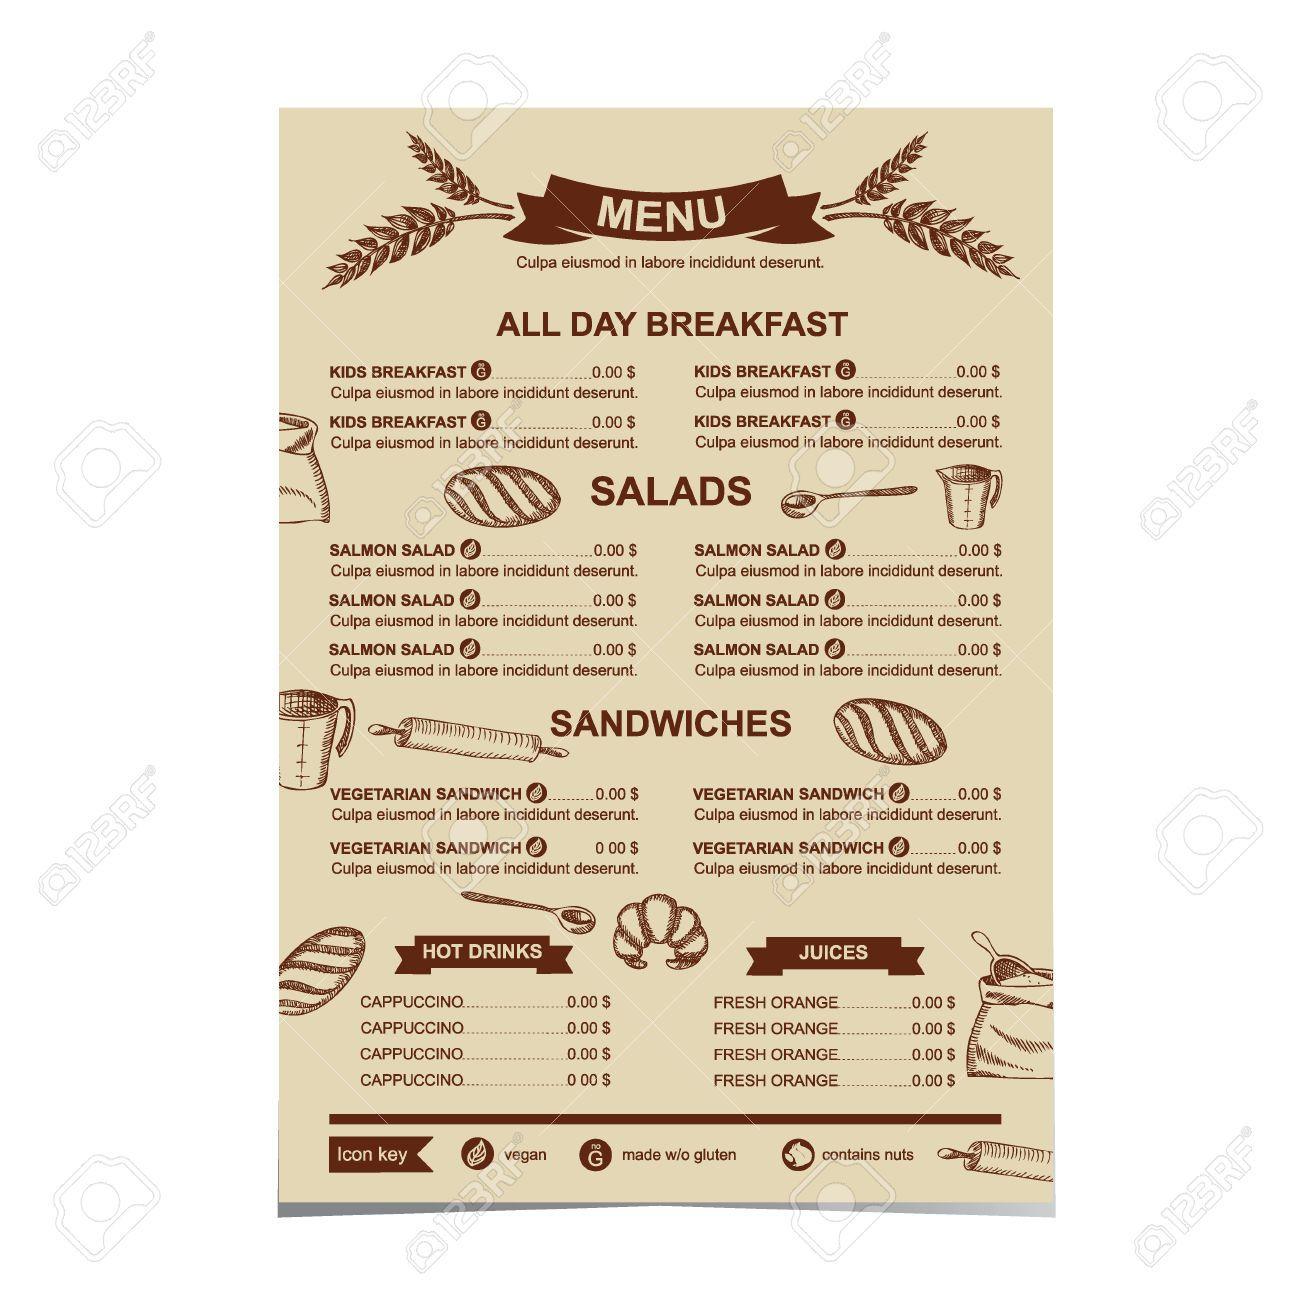 RestaurantMenuBakeryAndCafeTemplateDesignVector